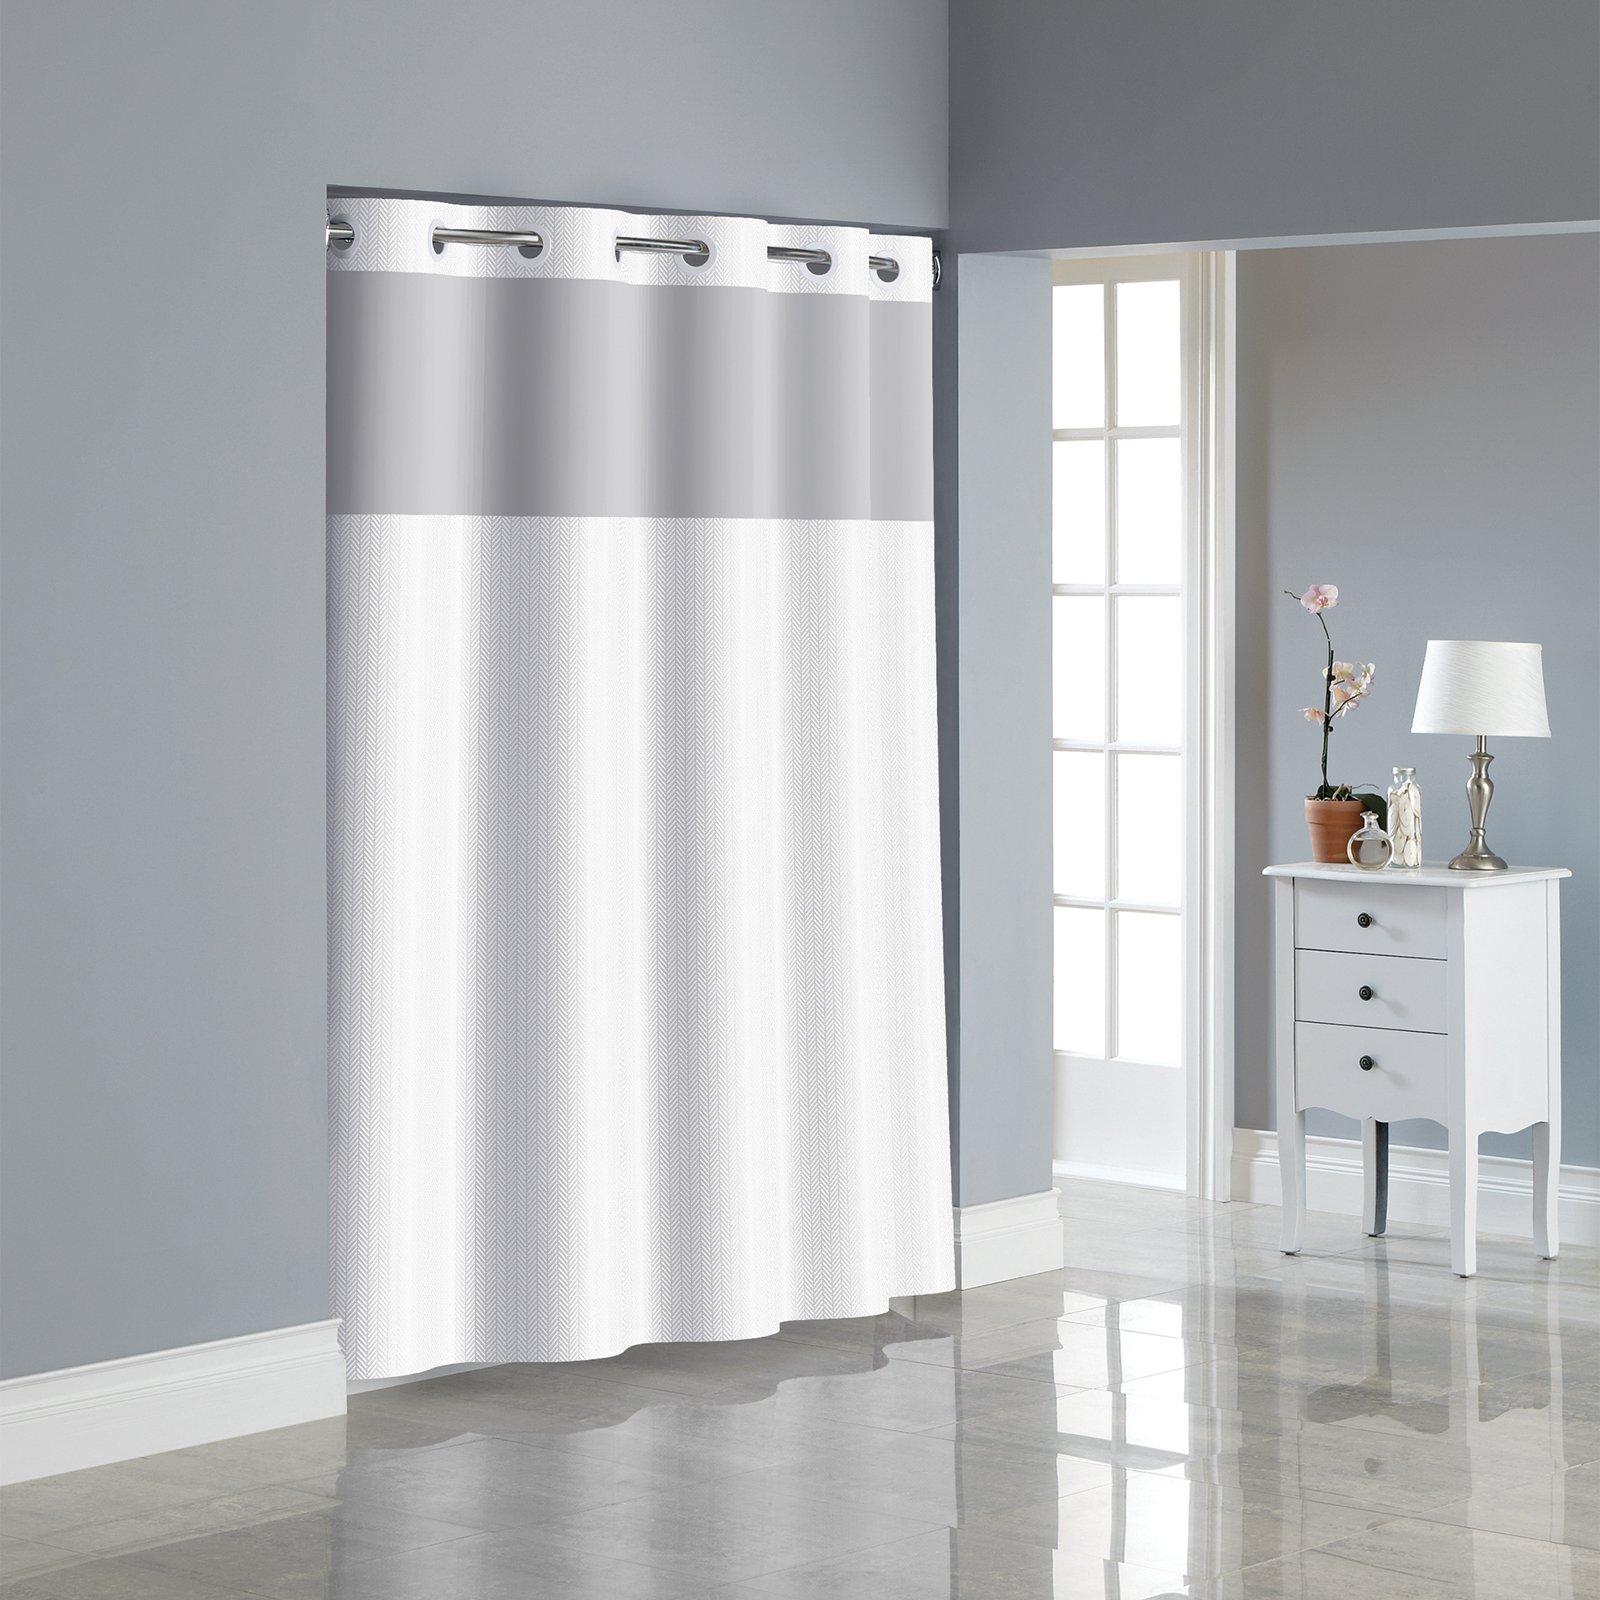 stunning Kohls Curtain Part - 7: shower curtains